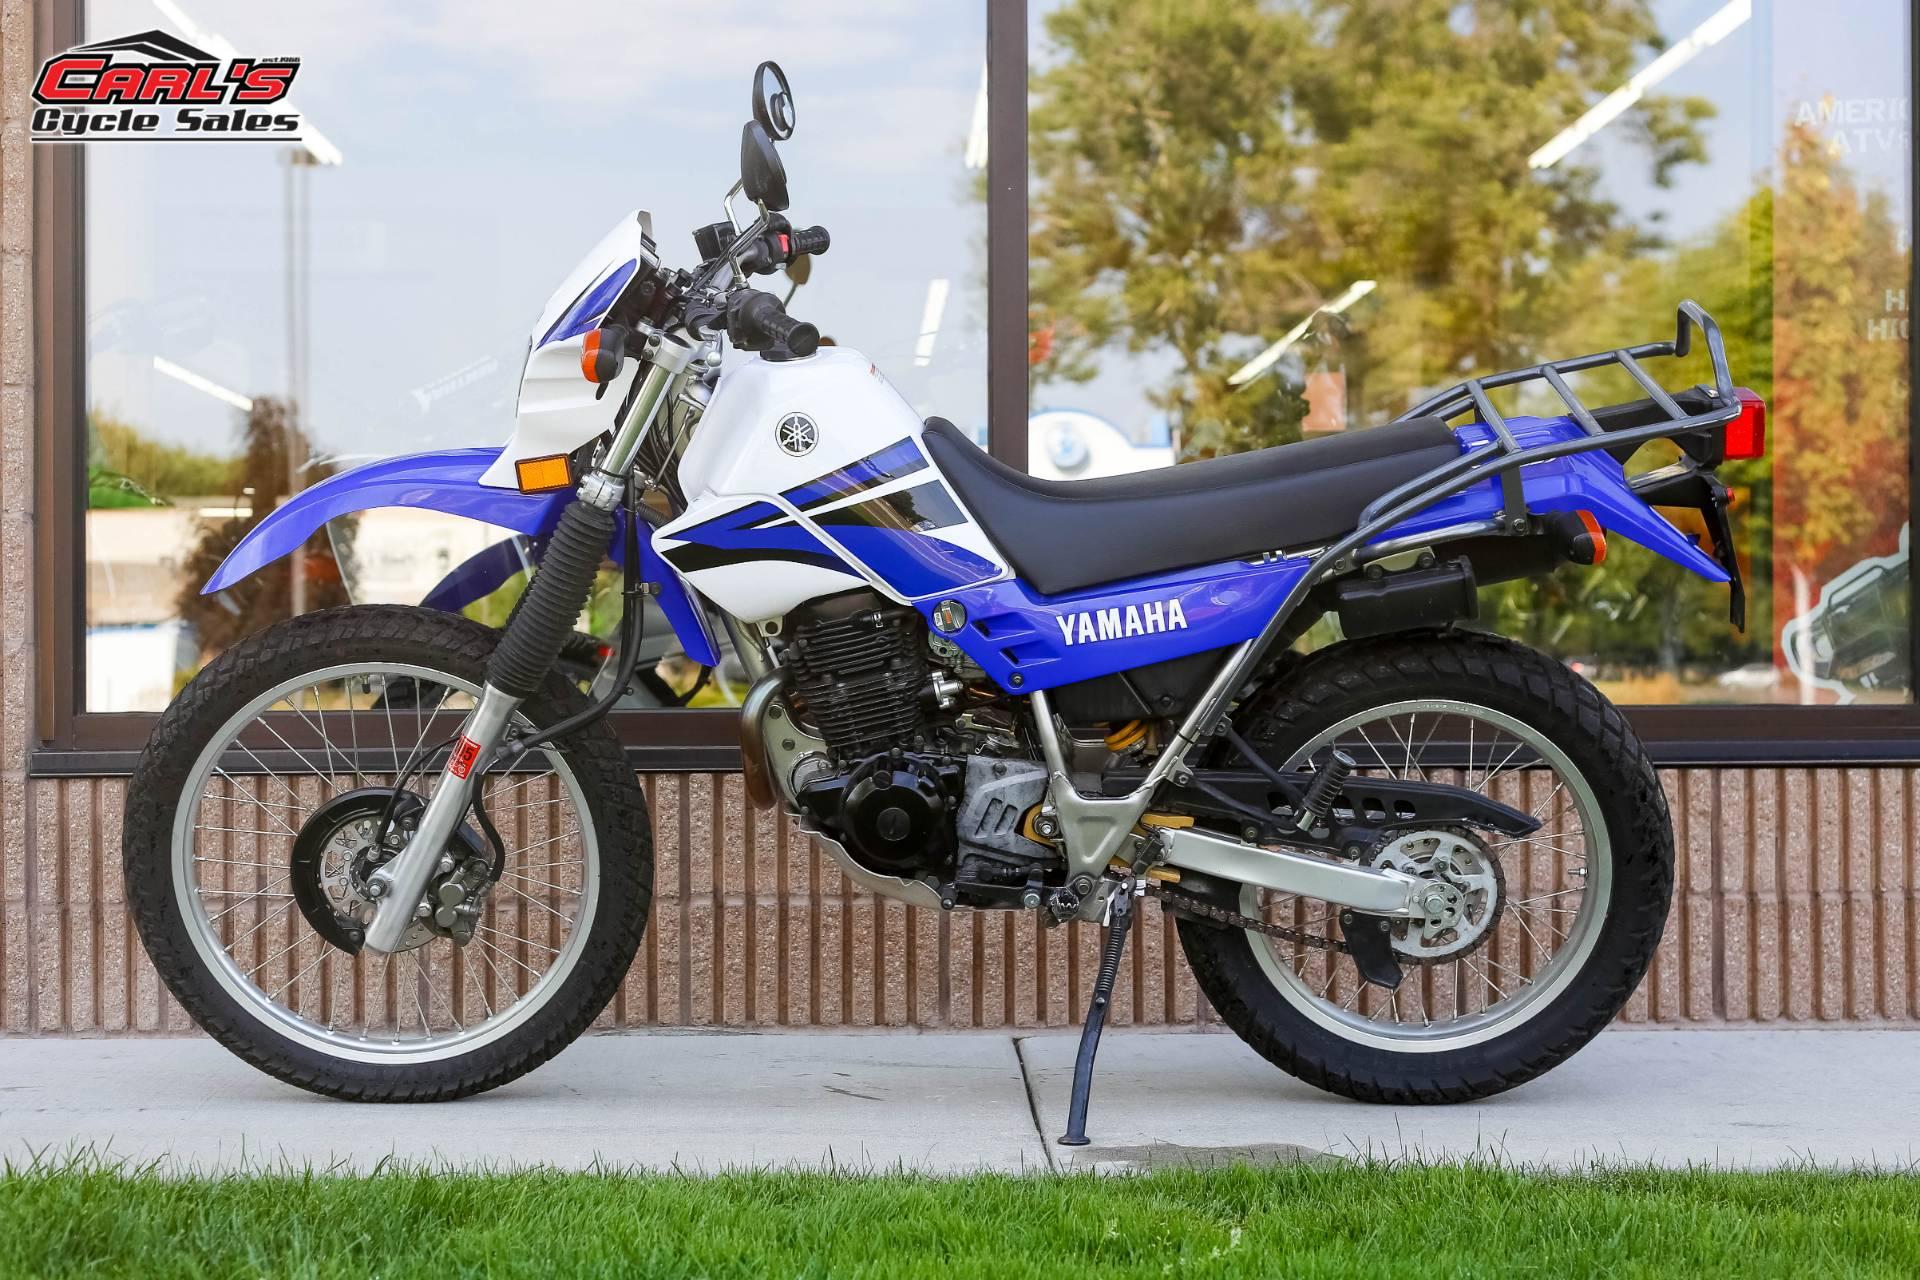 2007 XT225